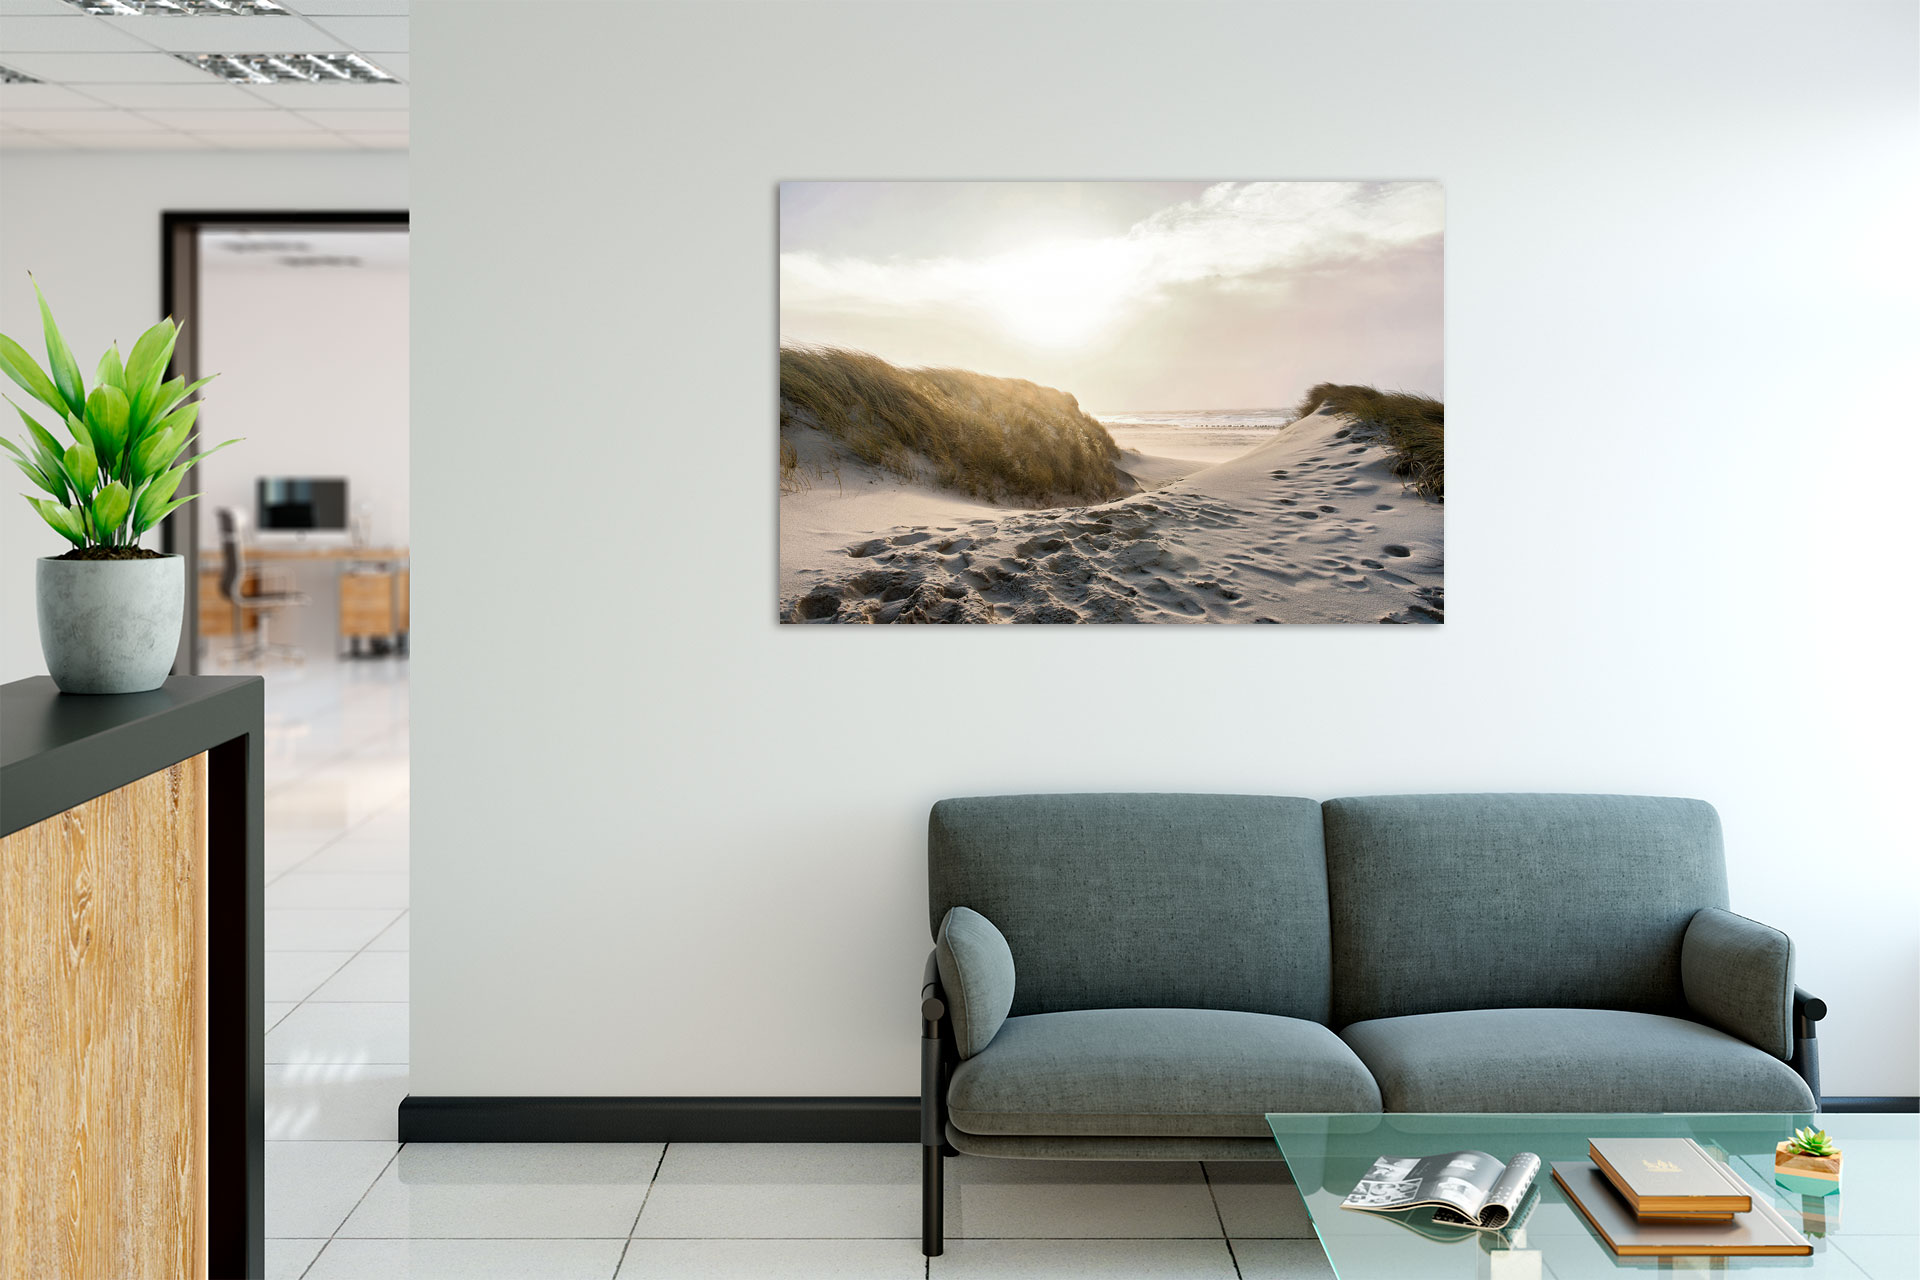 LCw500-sylt-duene-wandbild-bild-auf-leinwand-acrylglas-aludibond-empfang